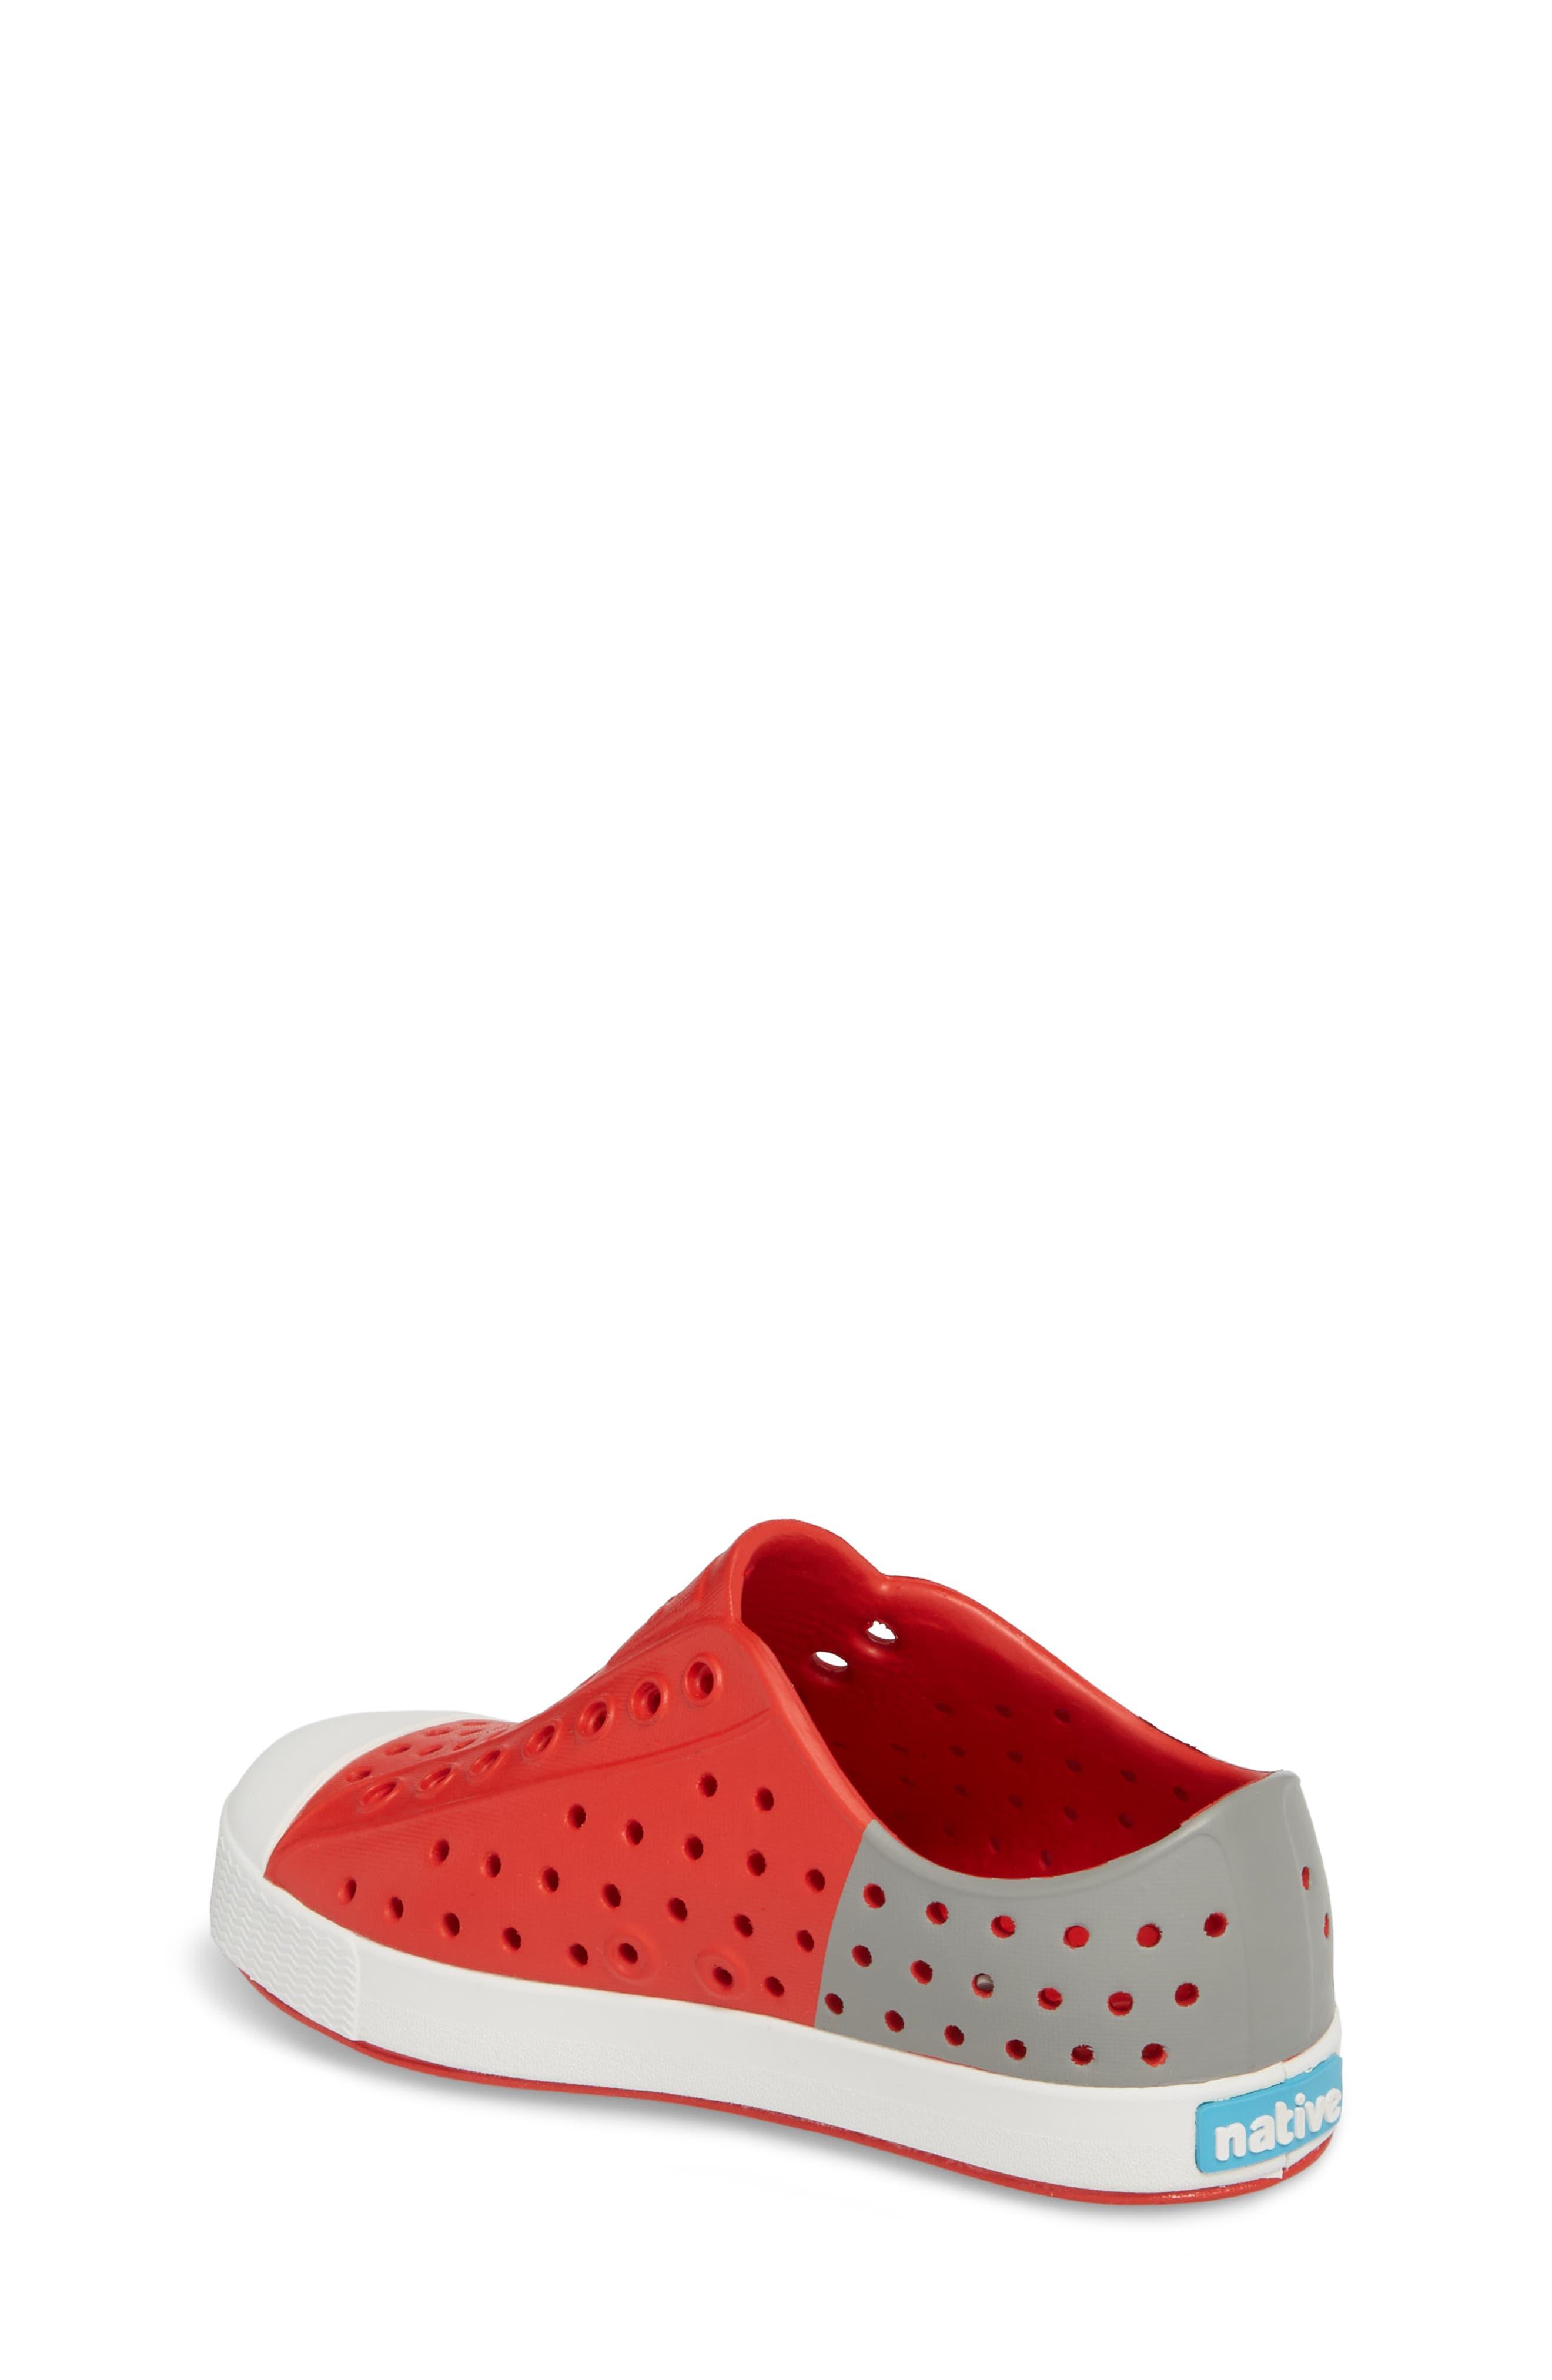 'Jefferson' Water Friendly Slip-On Sneaker,                             Alternate thumbnail 2, color,                             025